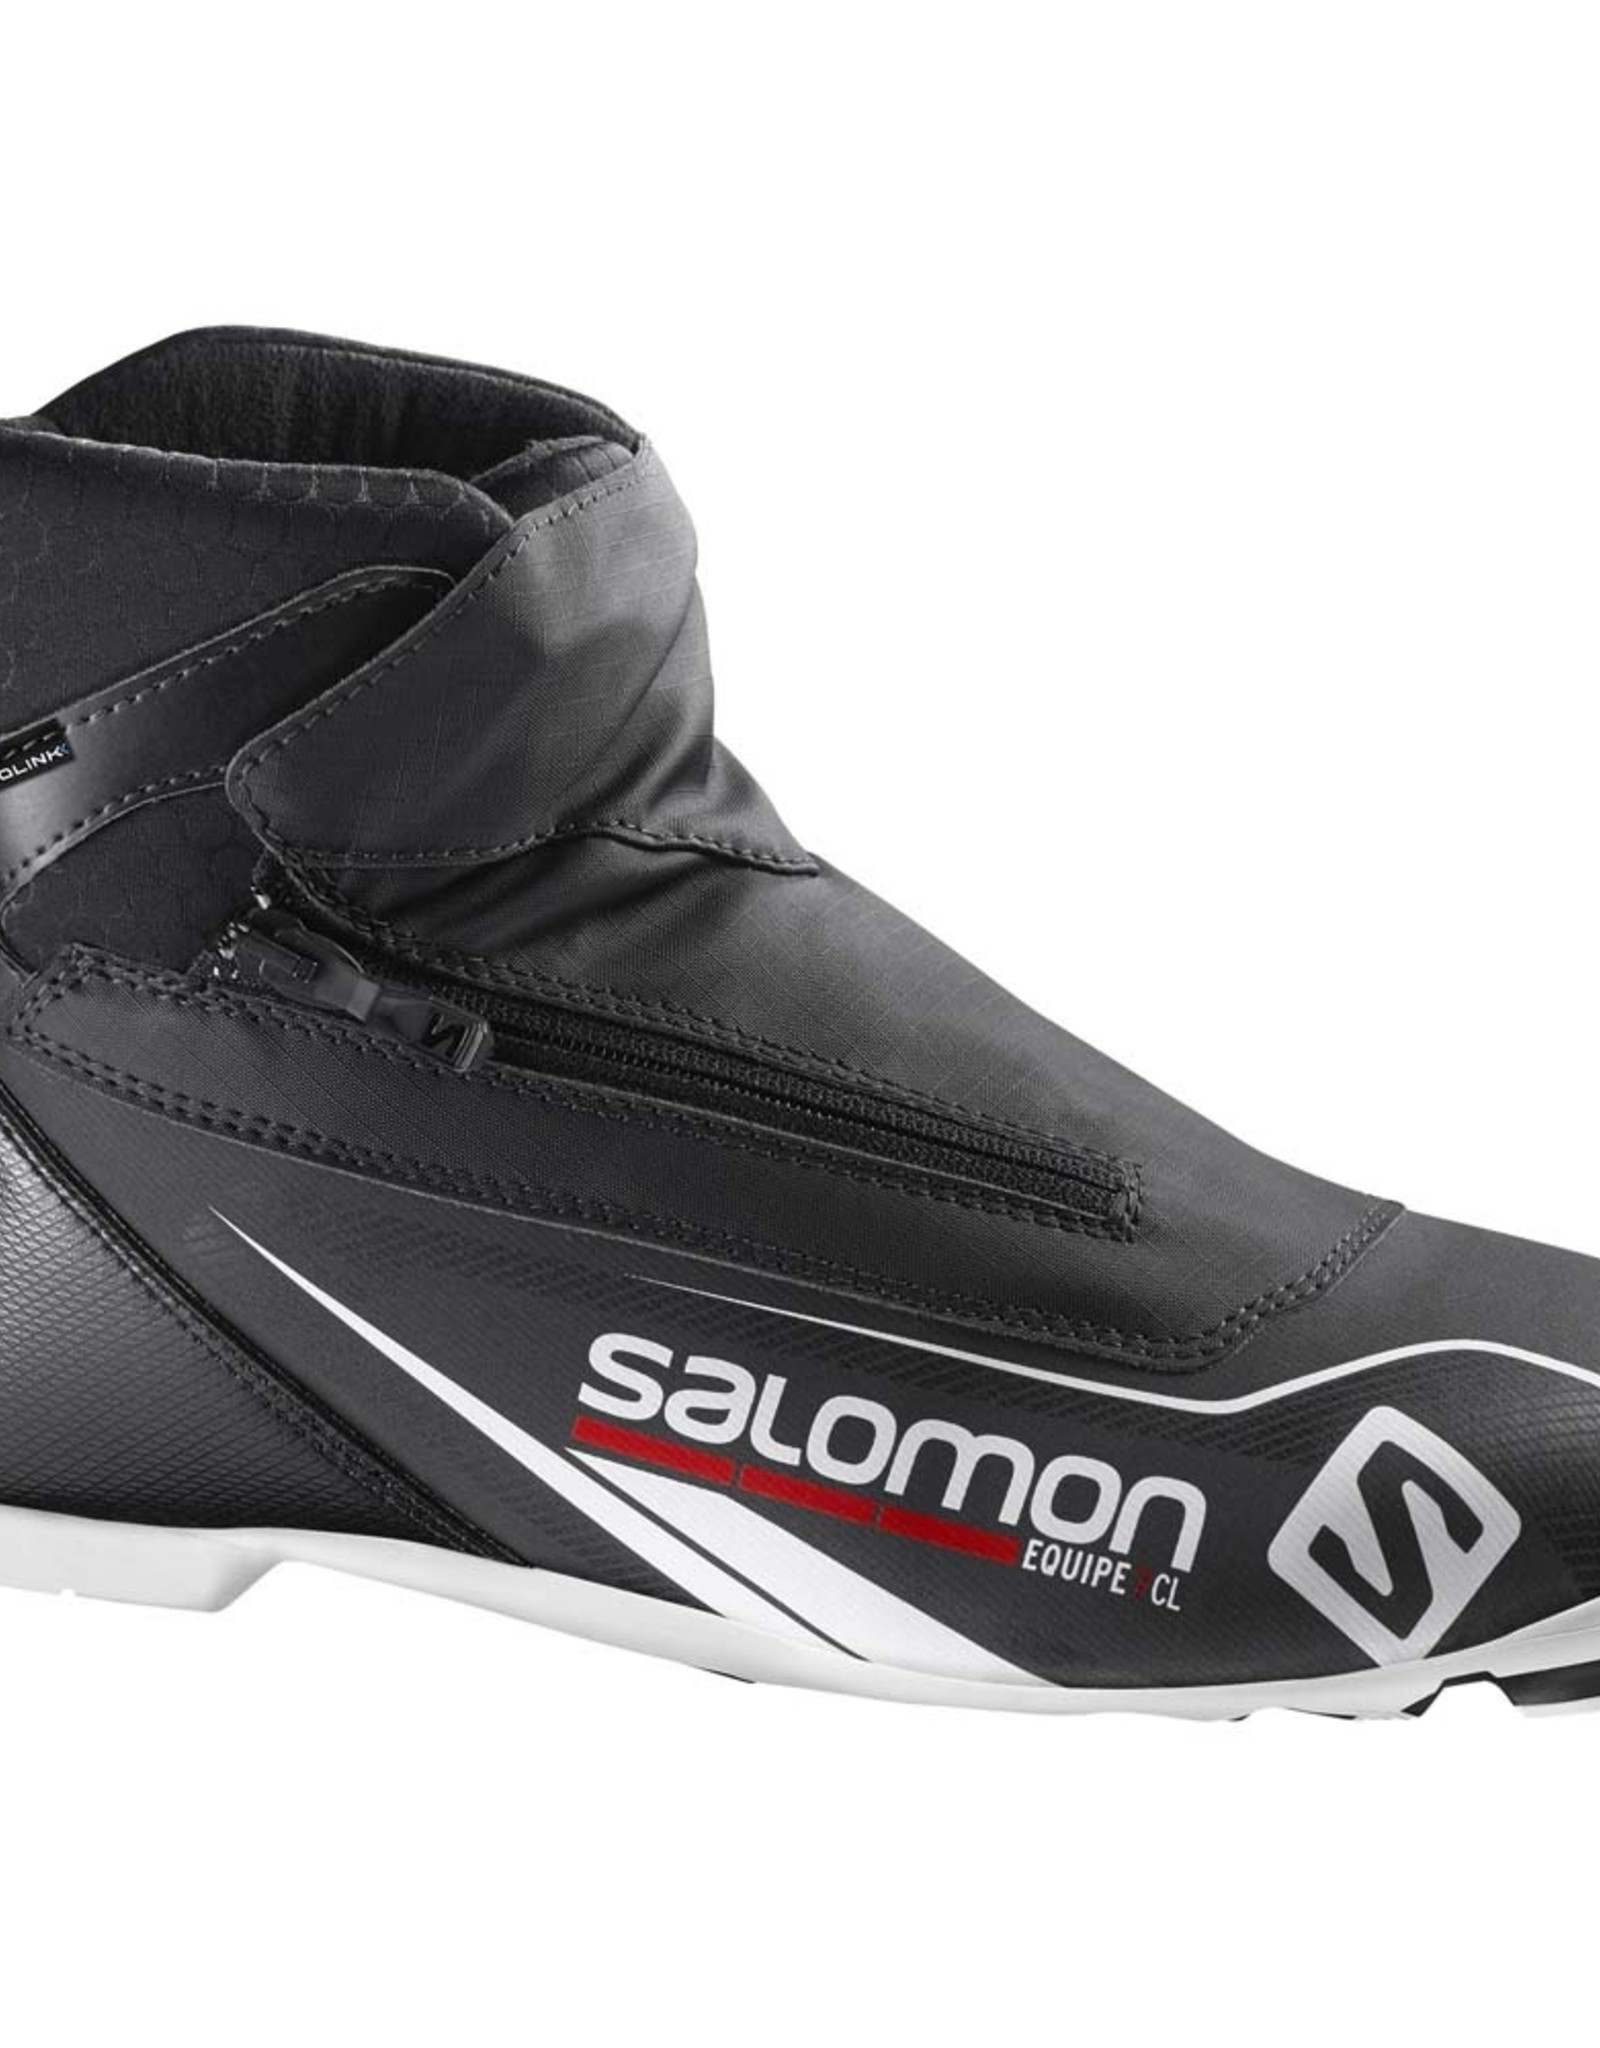 SALOMON Demo Equipe 7 Classic Prolink Boot